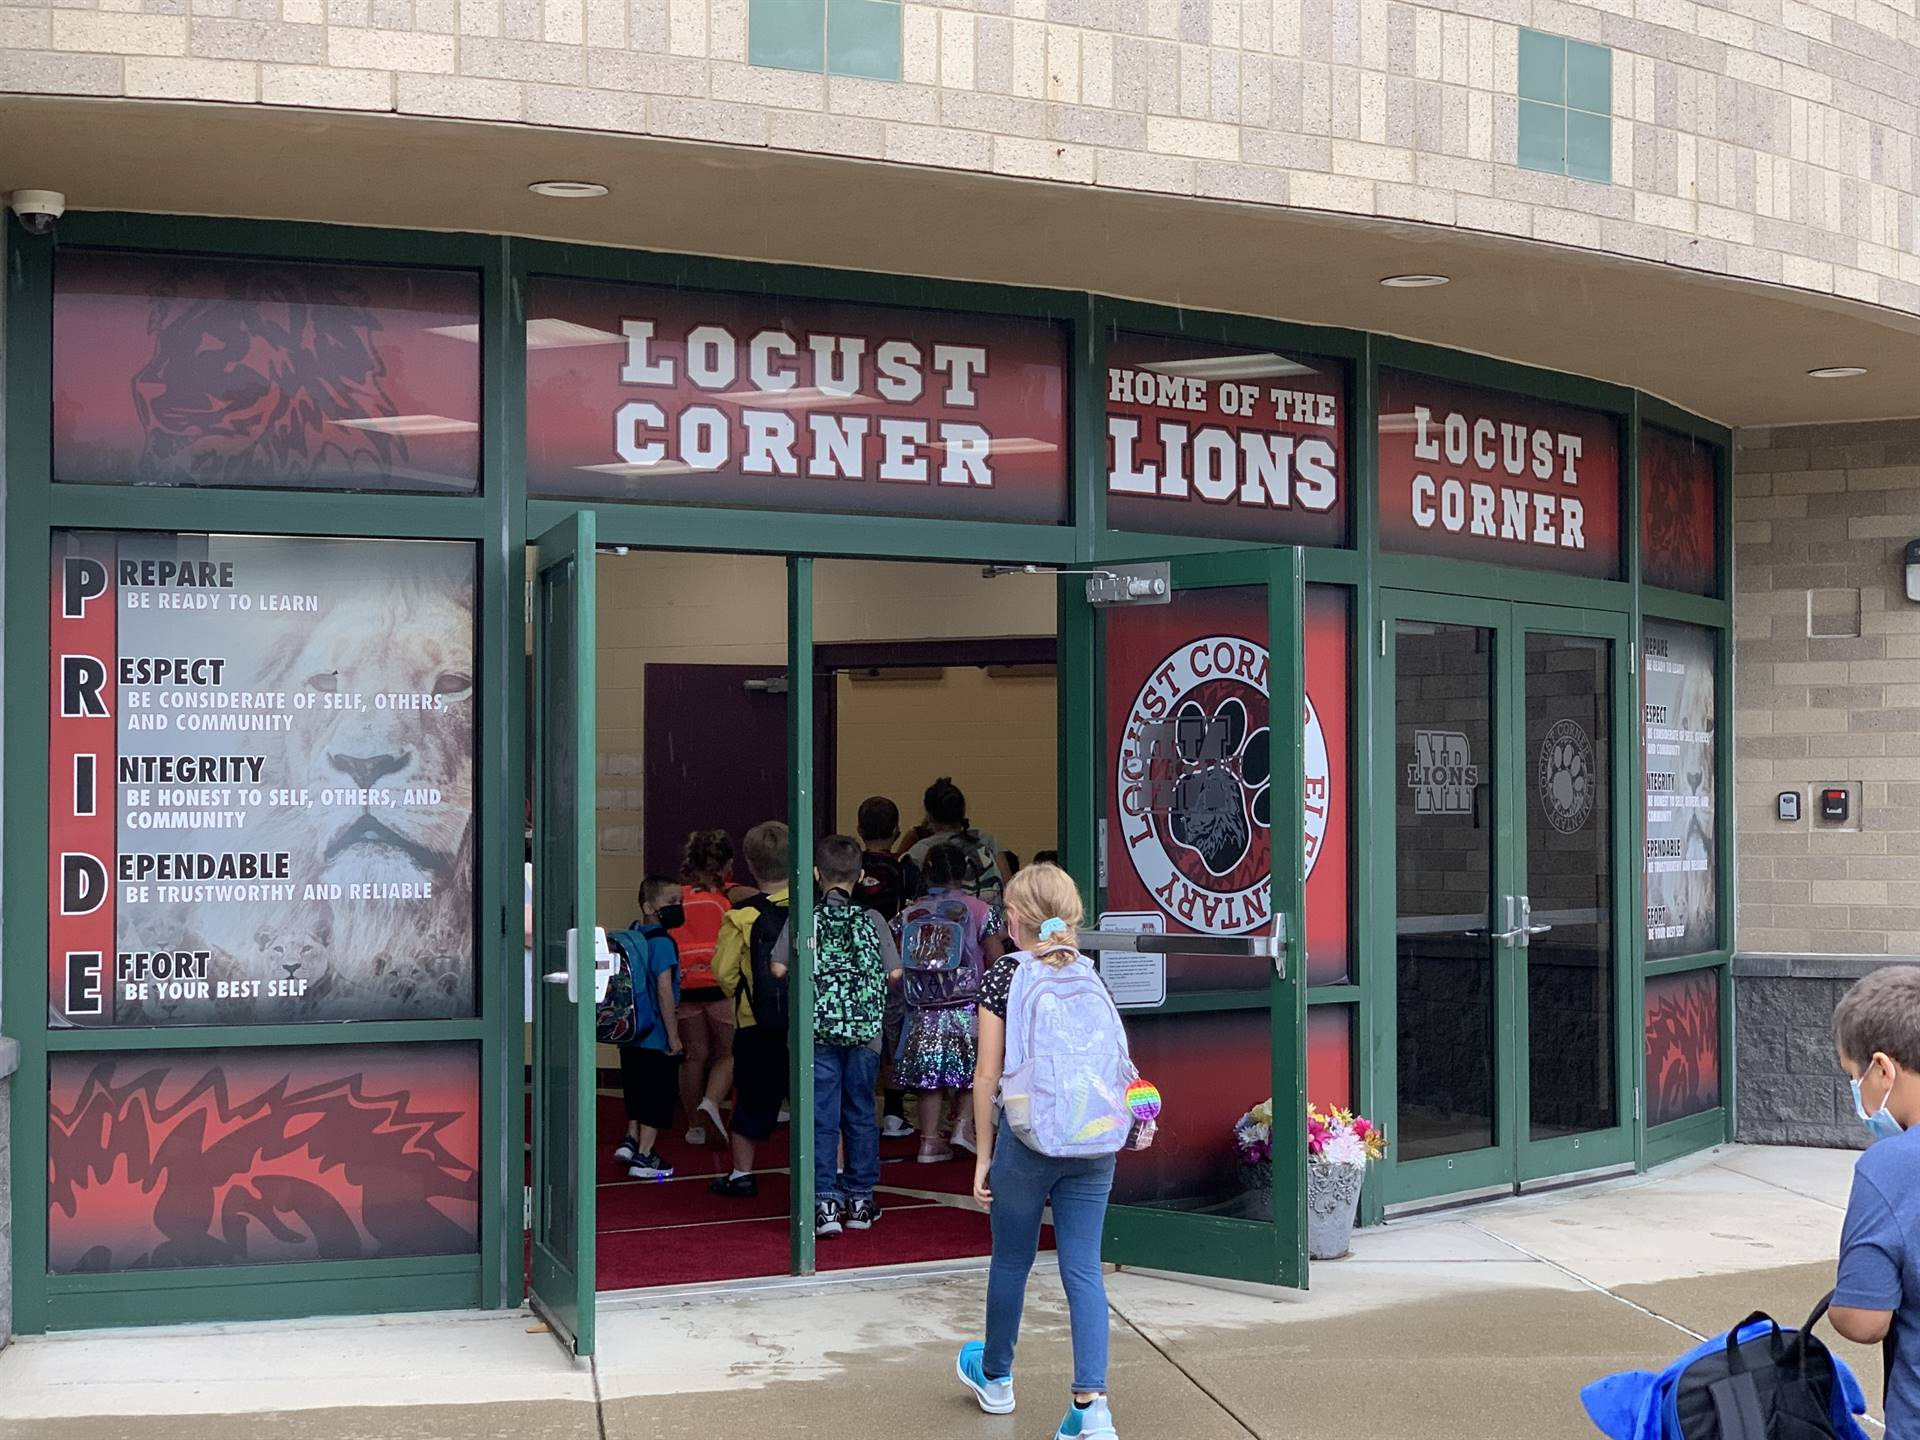 Students enter building at Locust Corner